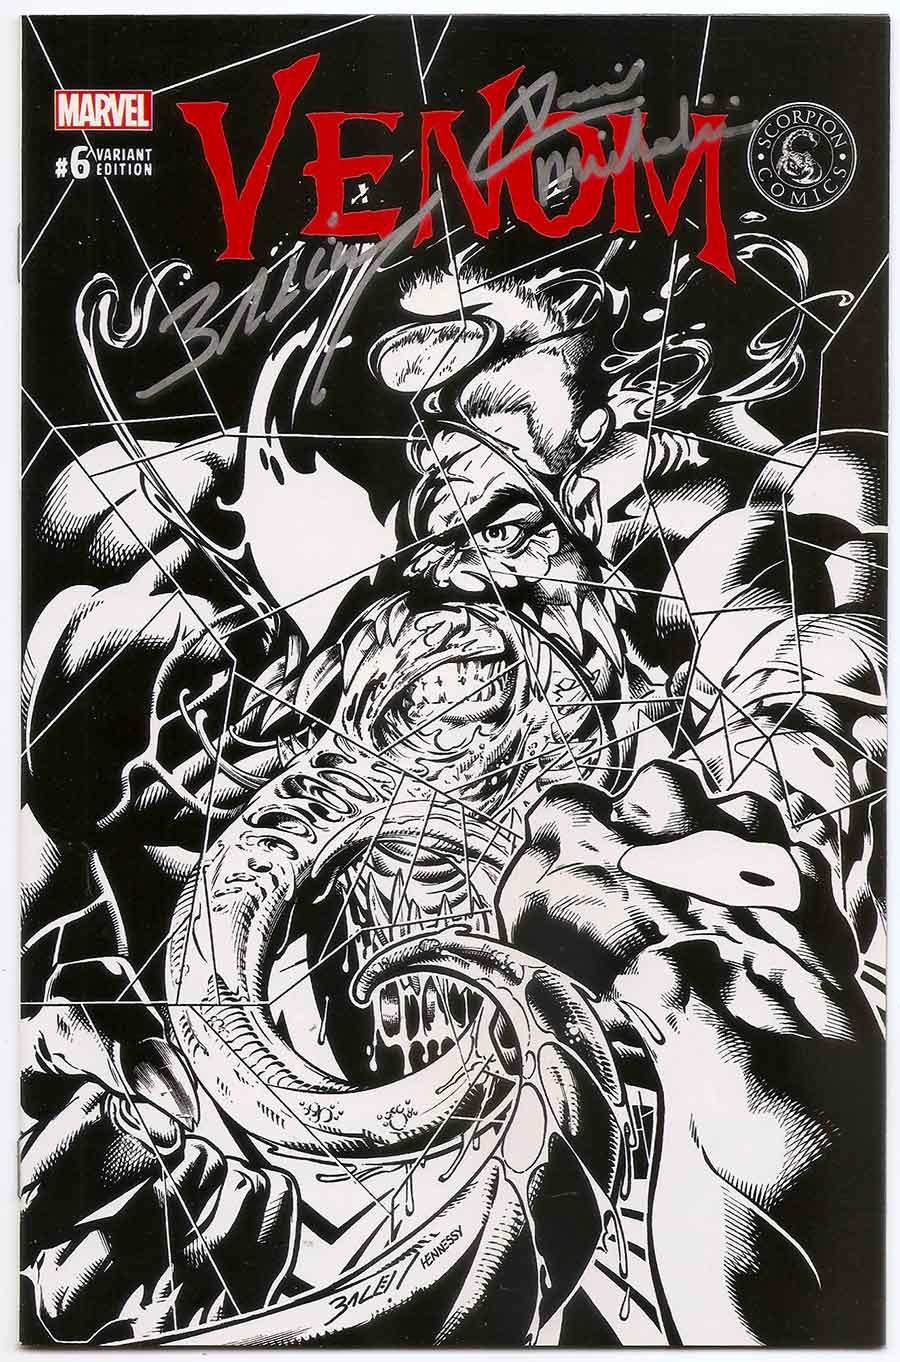 Venom (vol  3) # 06 Sketch Variant SIGNED Mark Bagley & David Michelinie